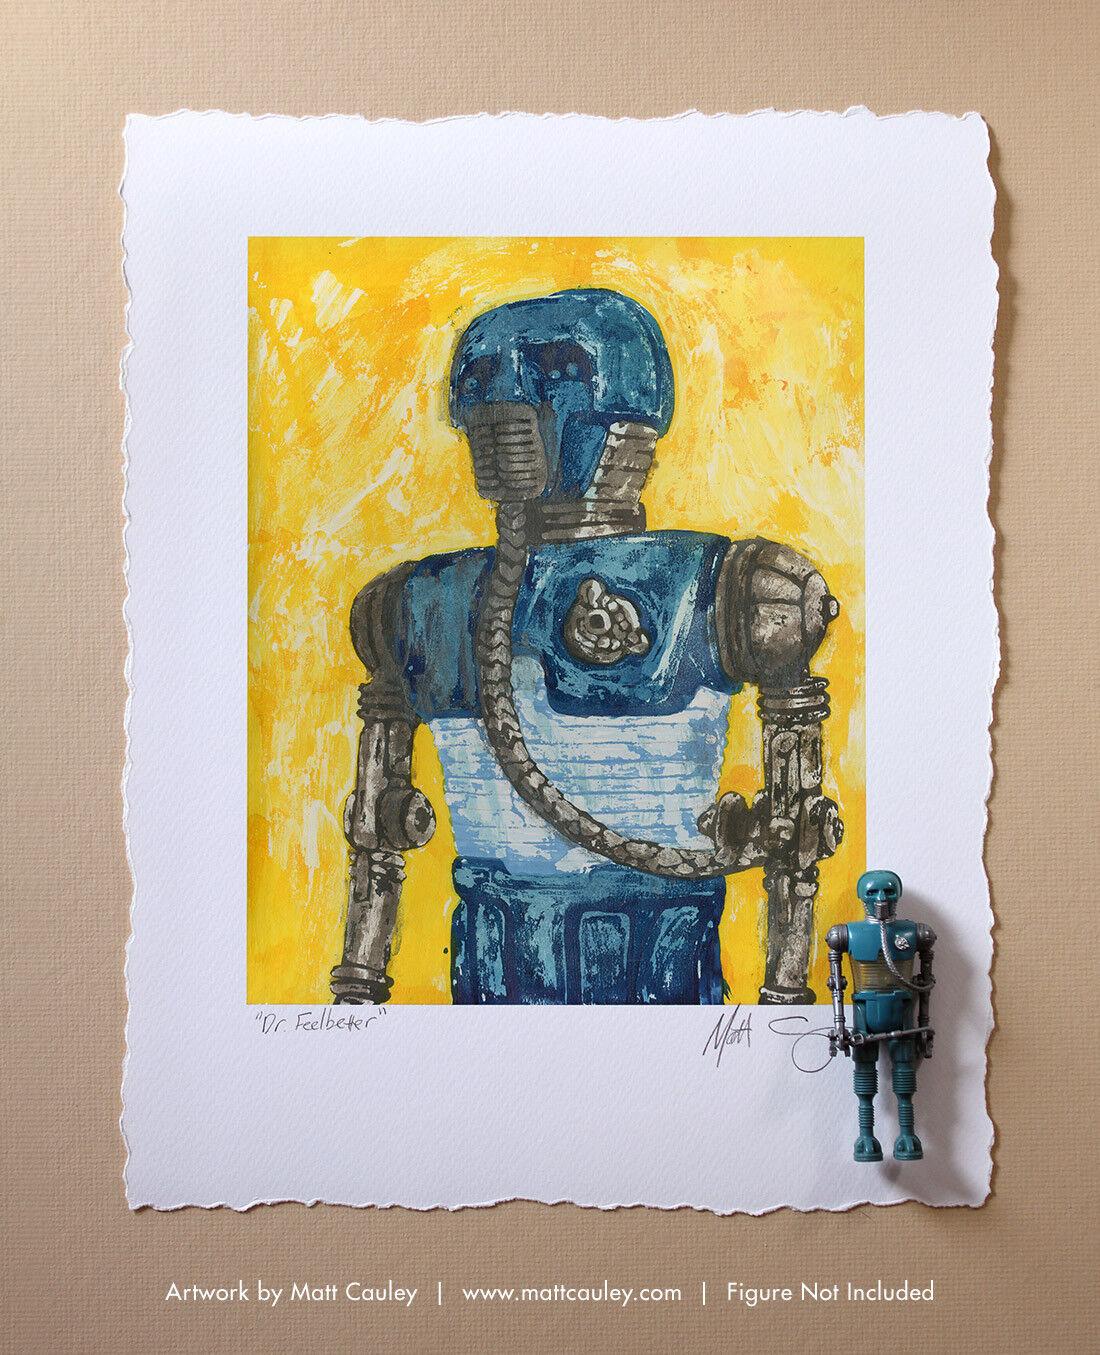 2-1B Vintage Kenner Star Wars ORIGINAL Action Figure ORIGINAL Wars ART PRINT 3.75 21B f41cba